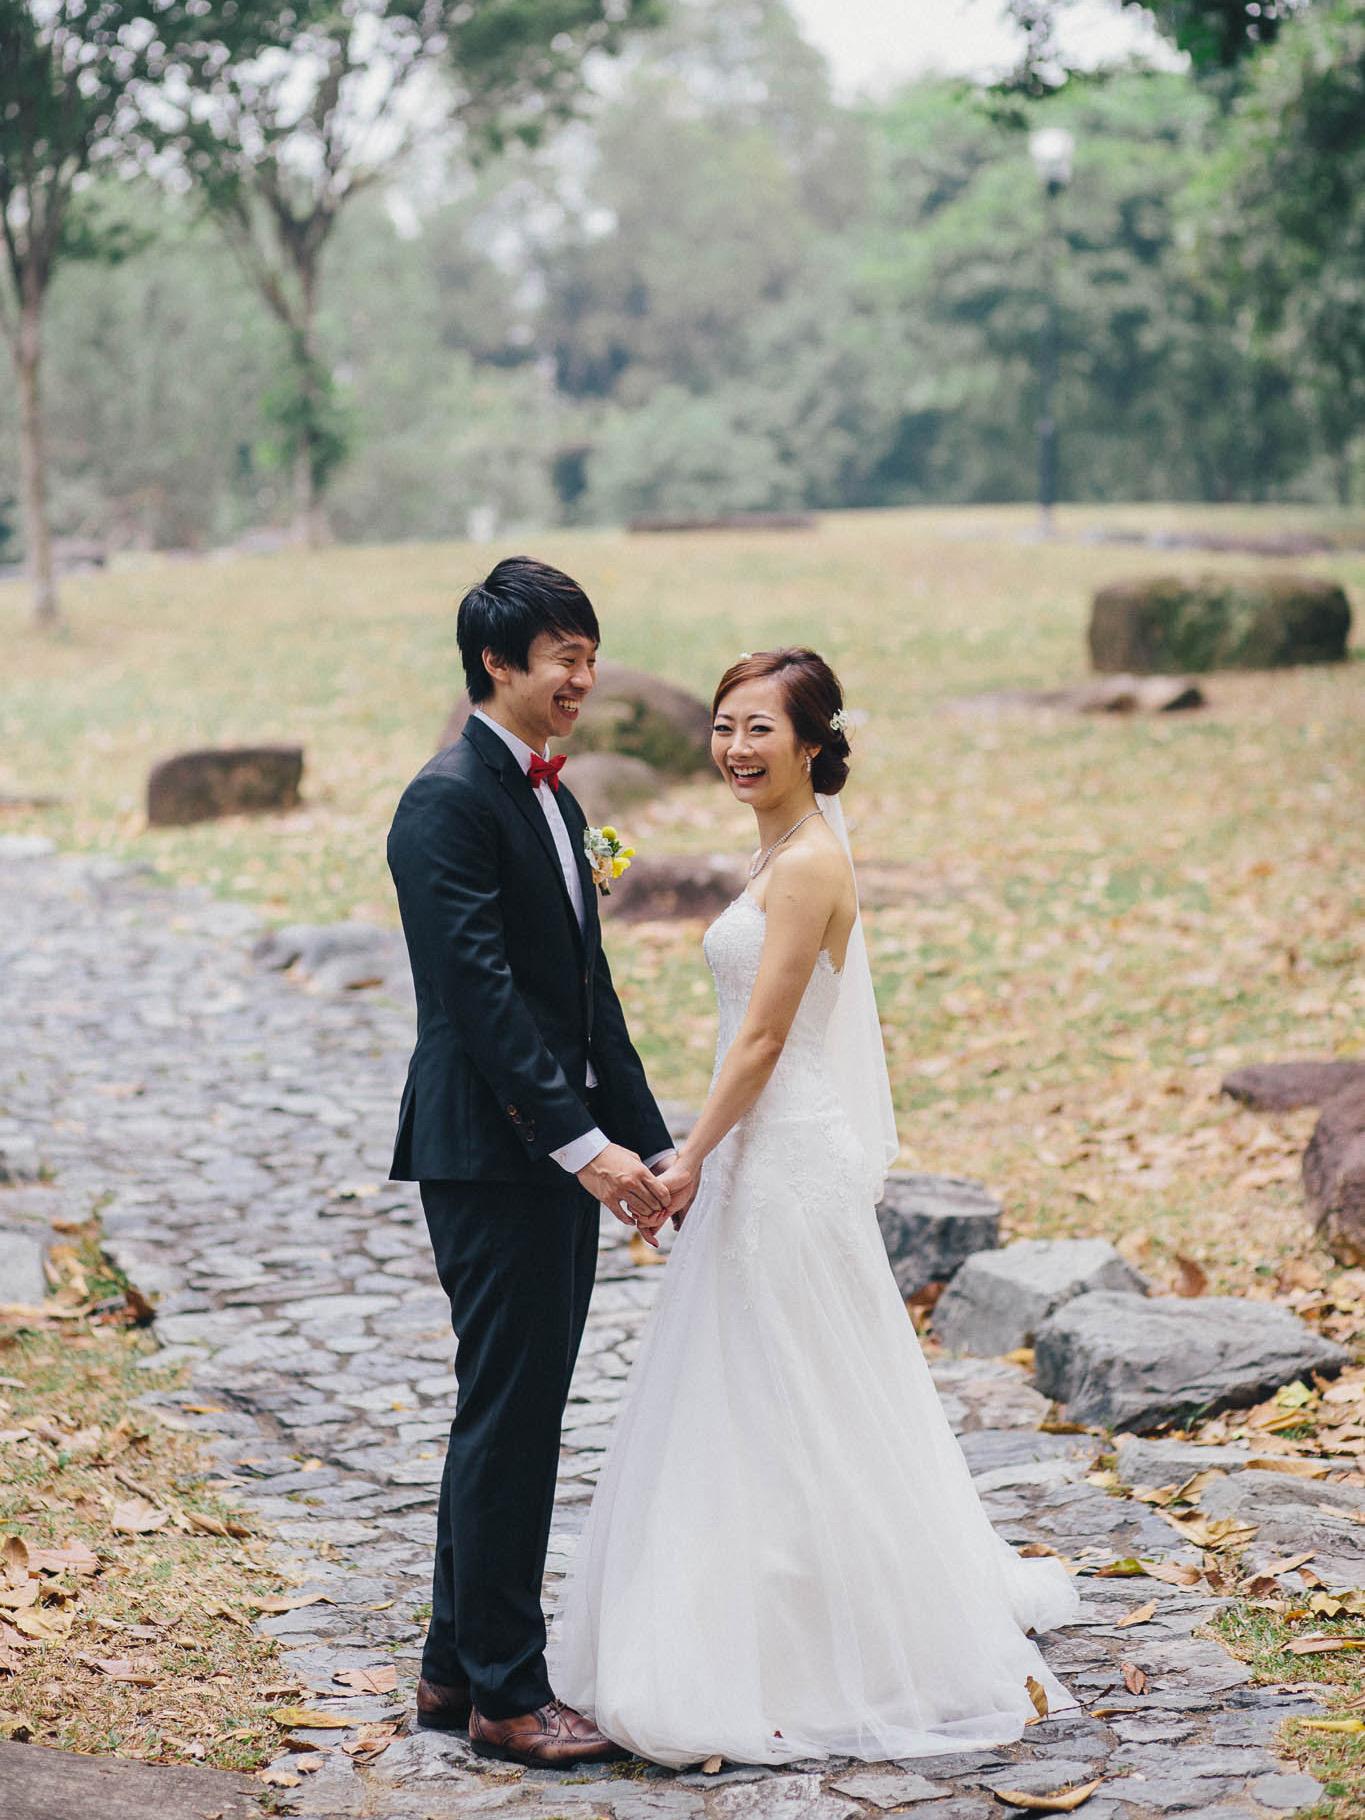 singapore-wedding-photographer-malay-indian-pre-wedding-travel-wmt-2015-46.jpg